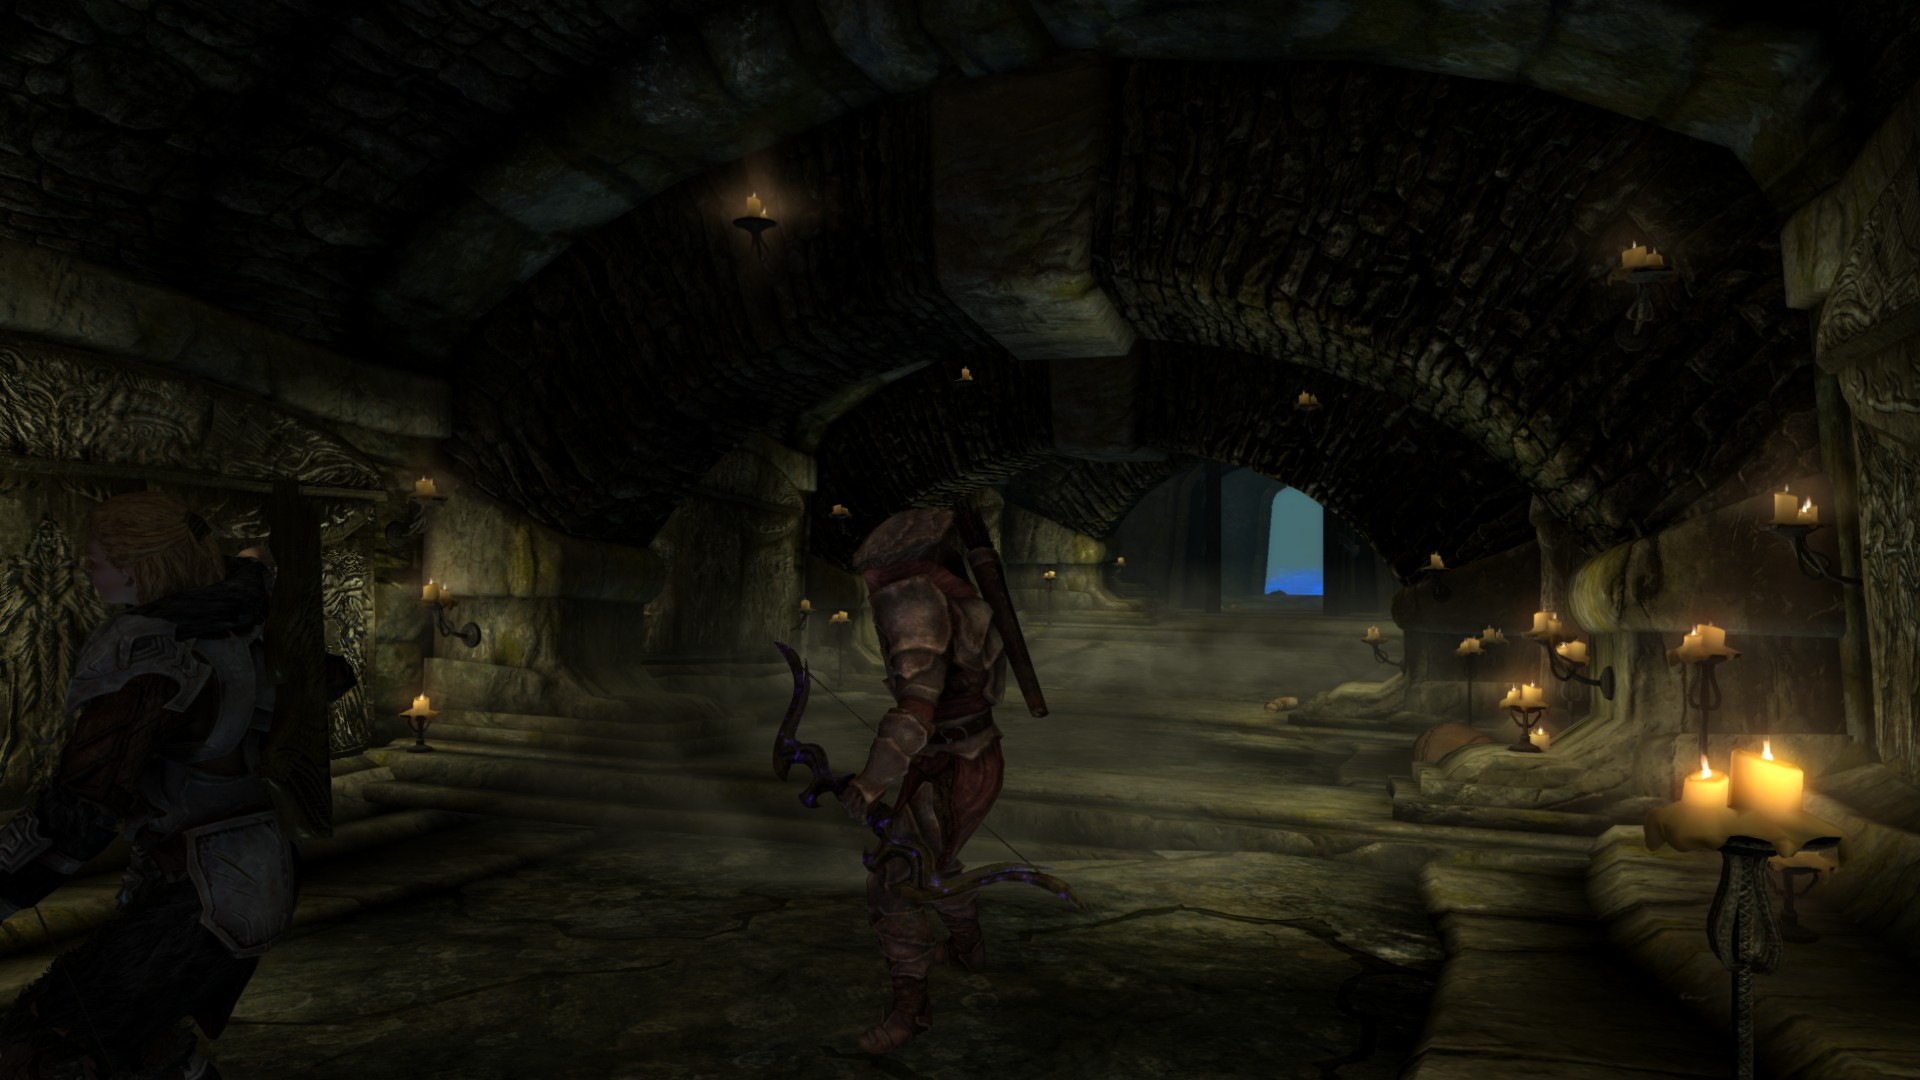 20180610135845_1.jpg - Elder Scrolls 5: Skyrim, the